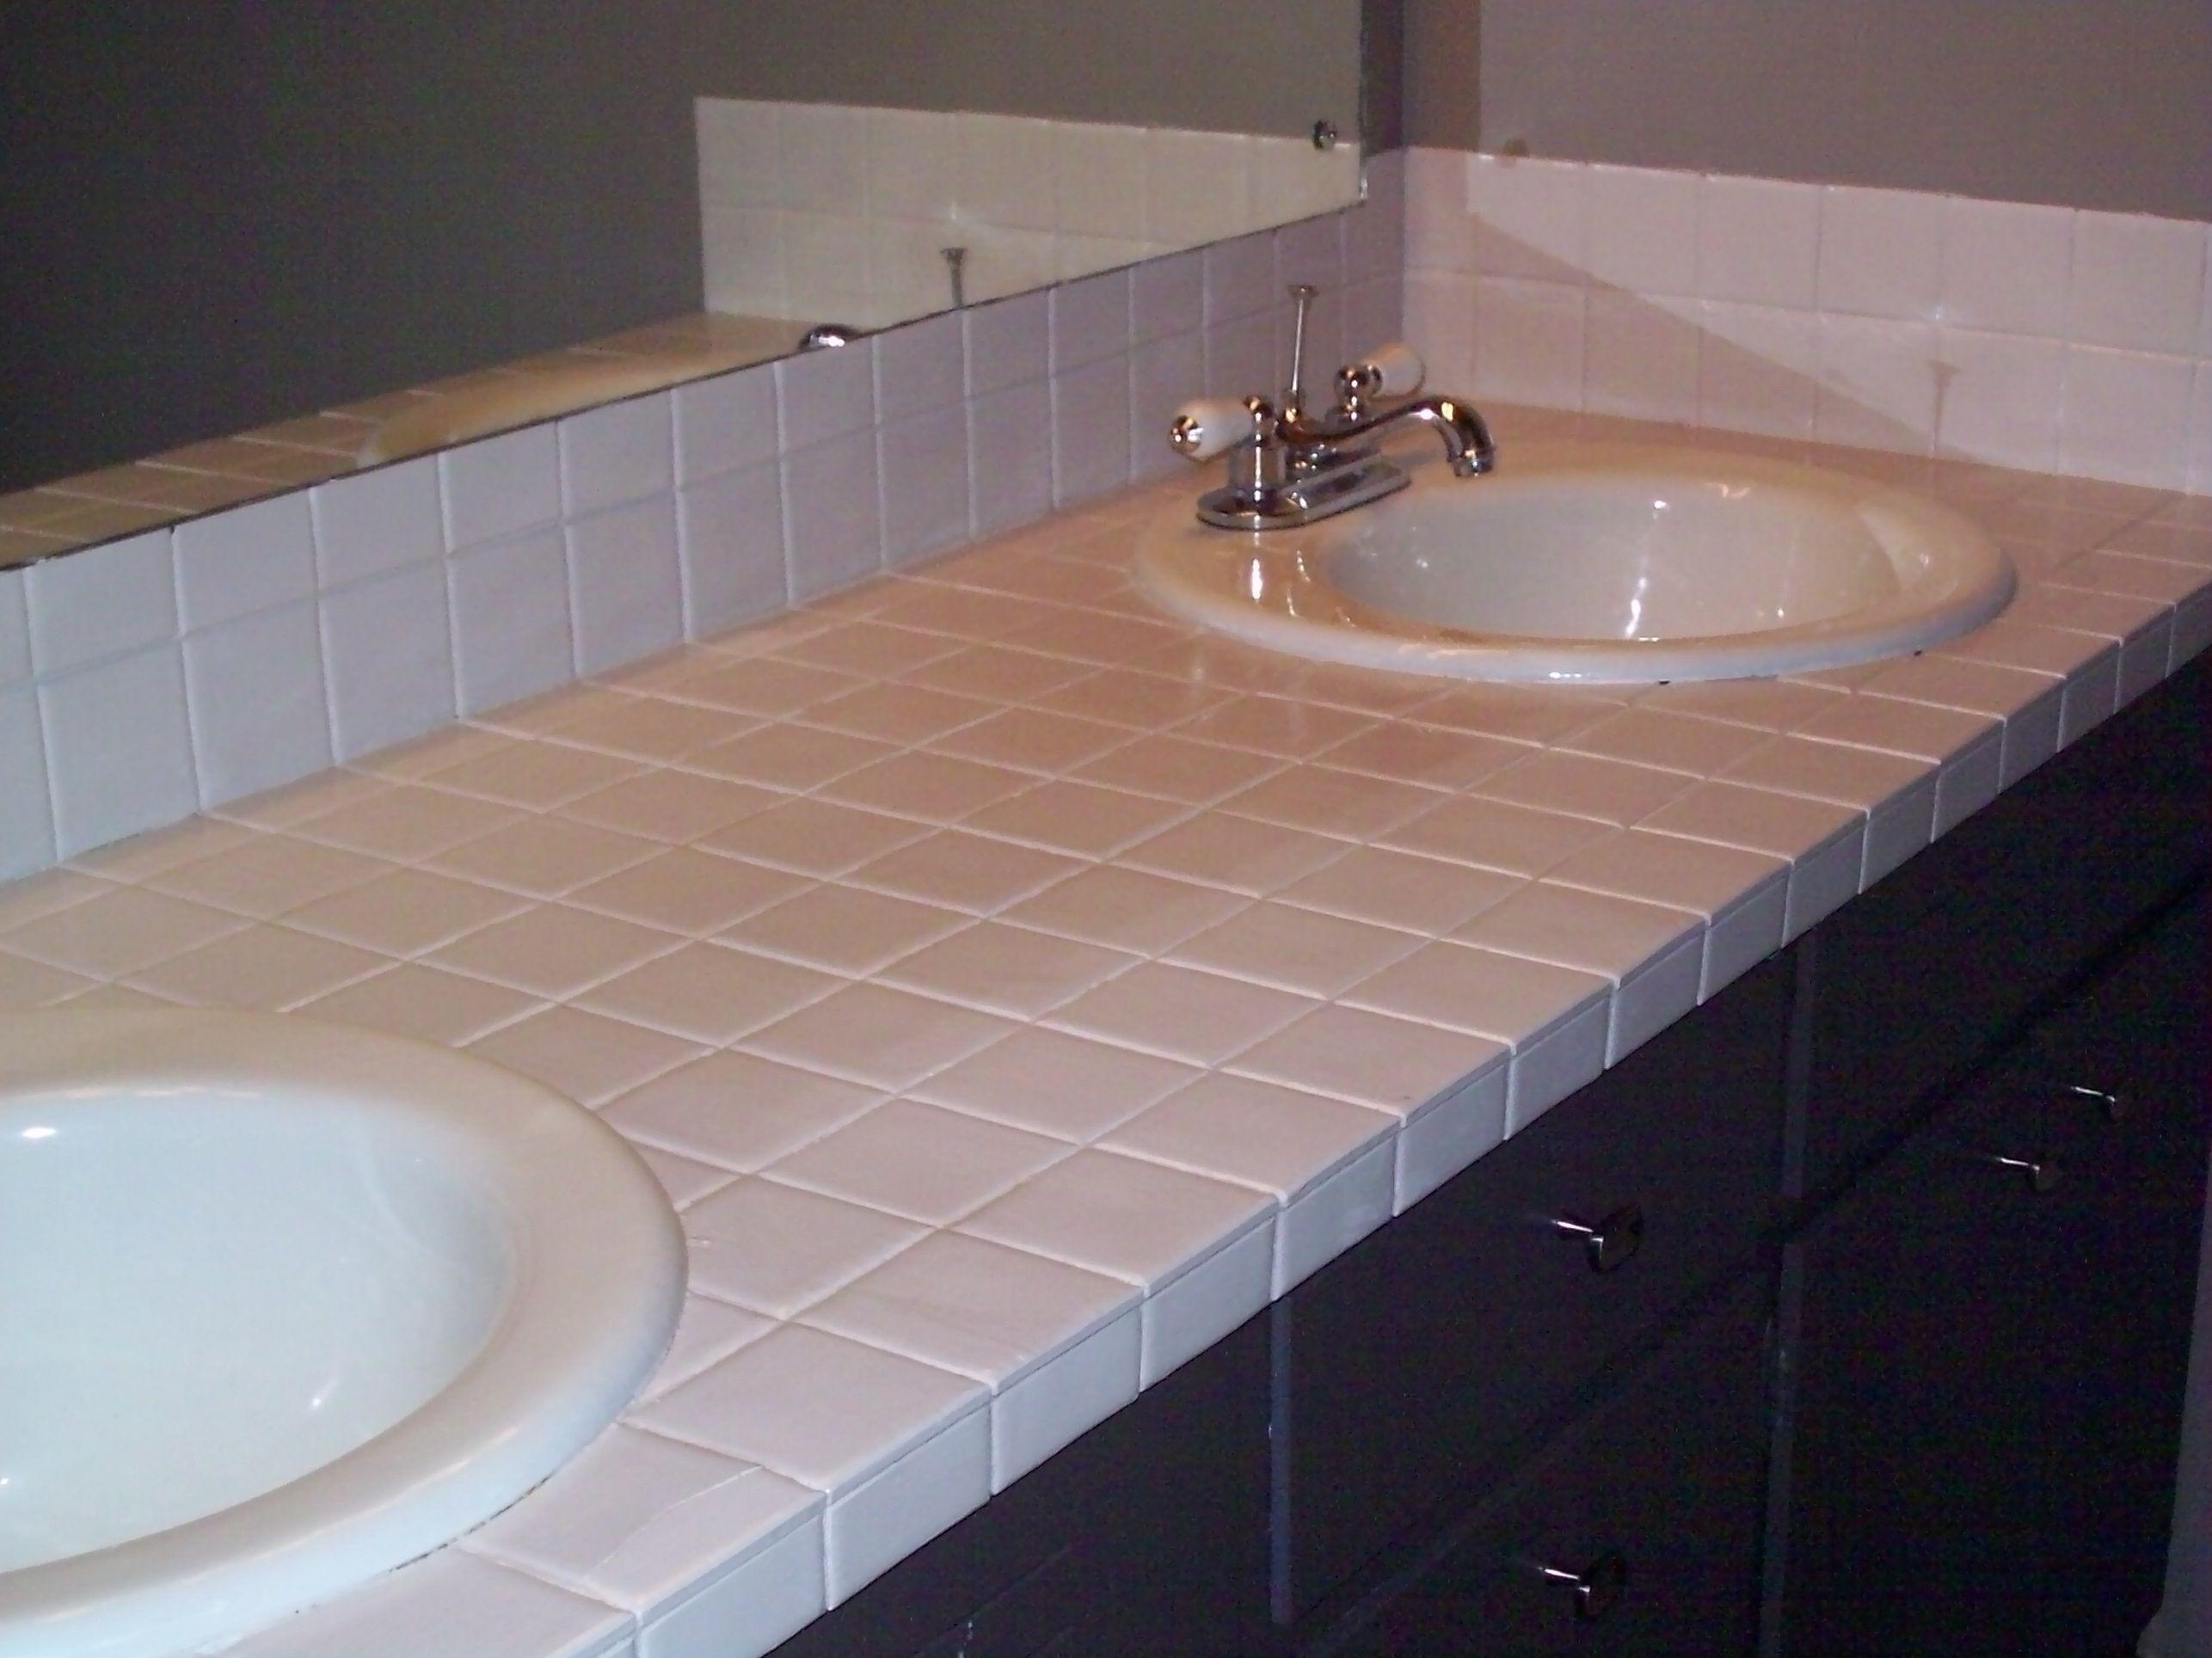 How to paint ceramic tile countertops lightkitchencountertops